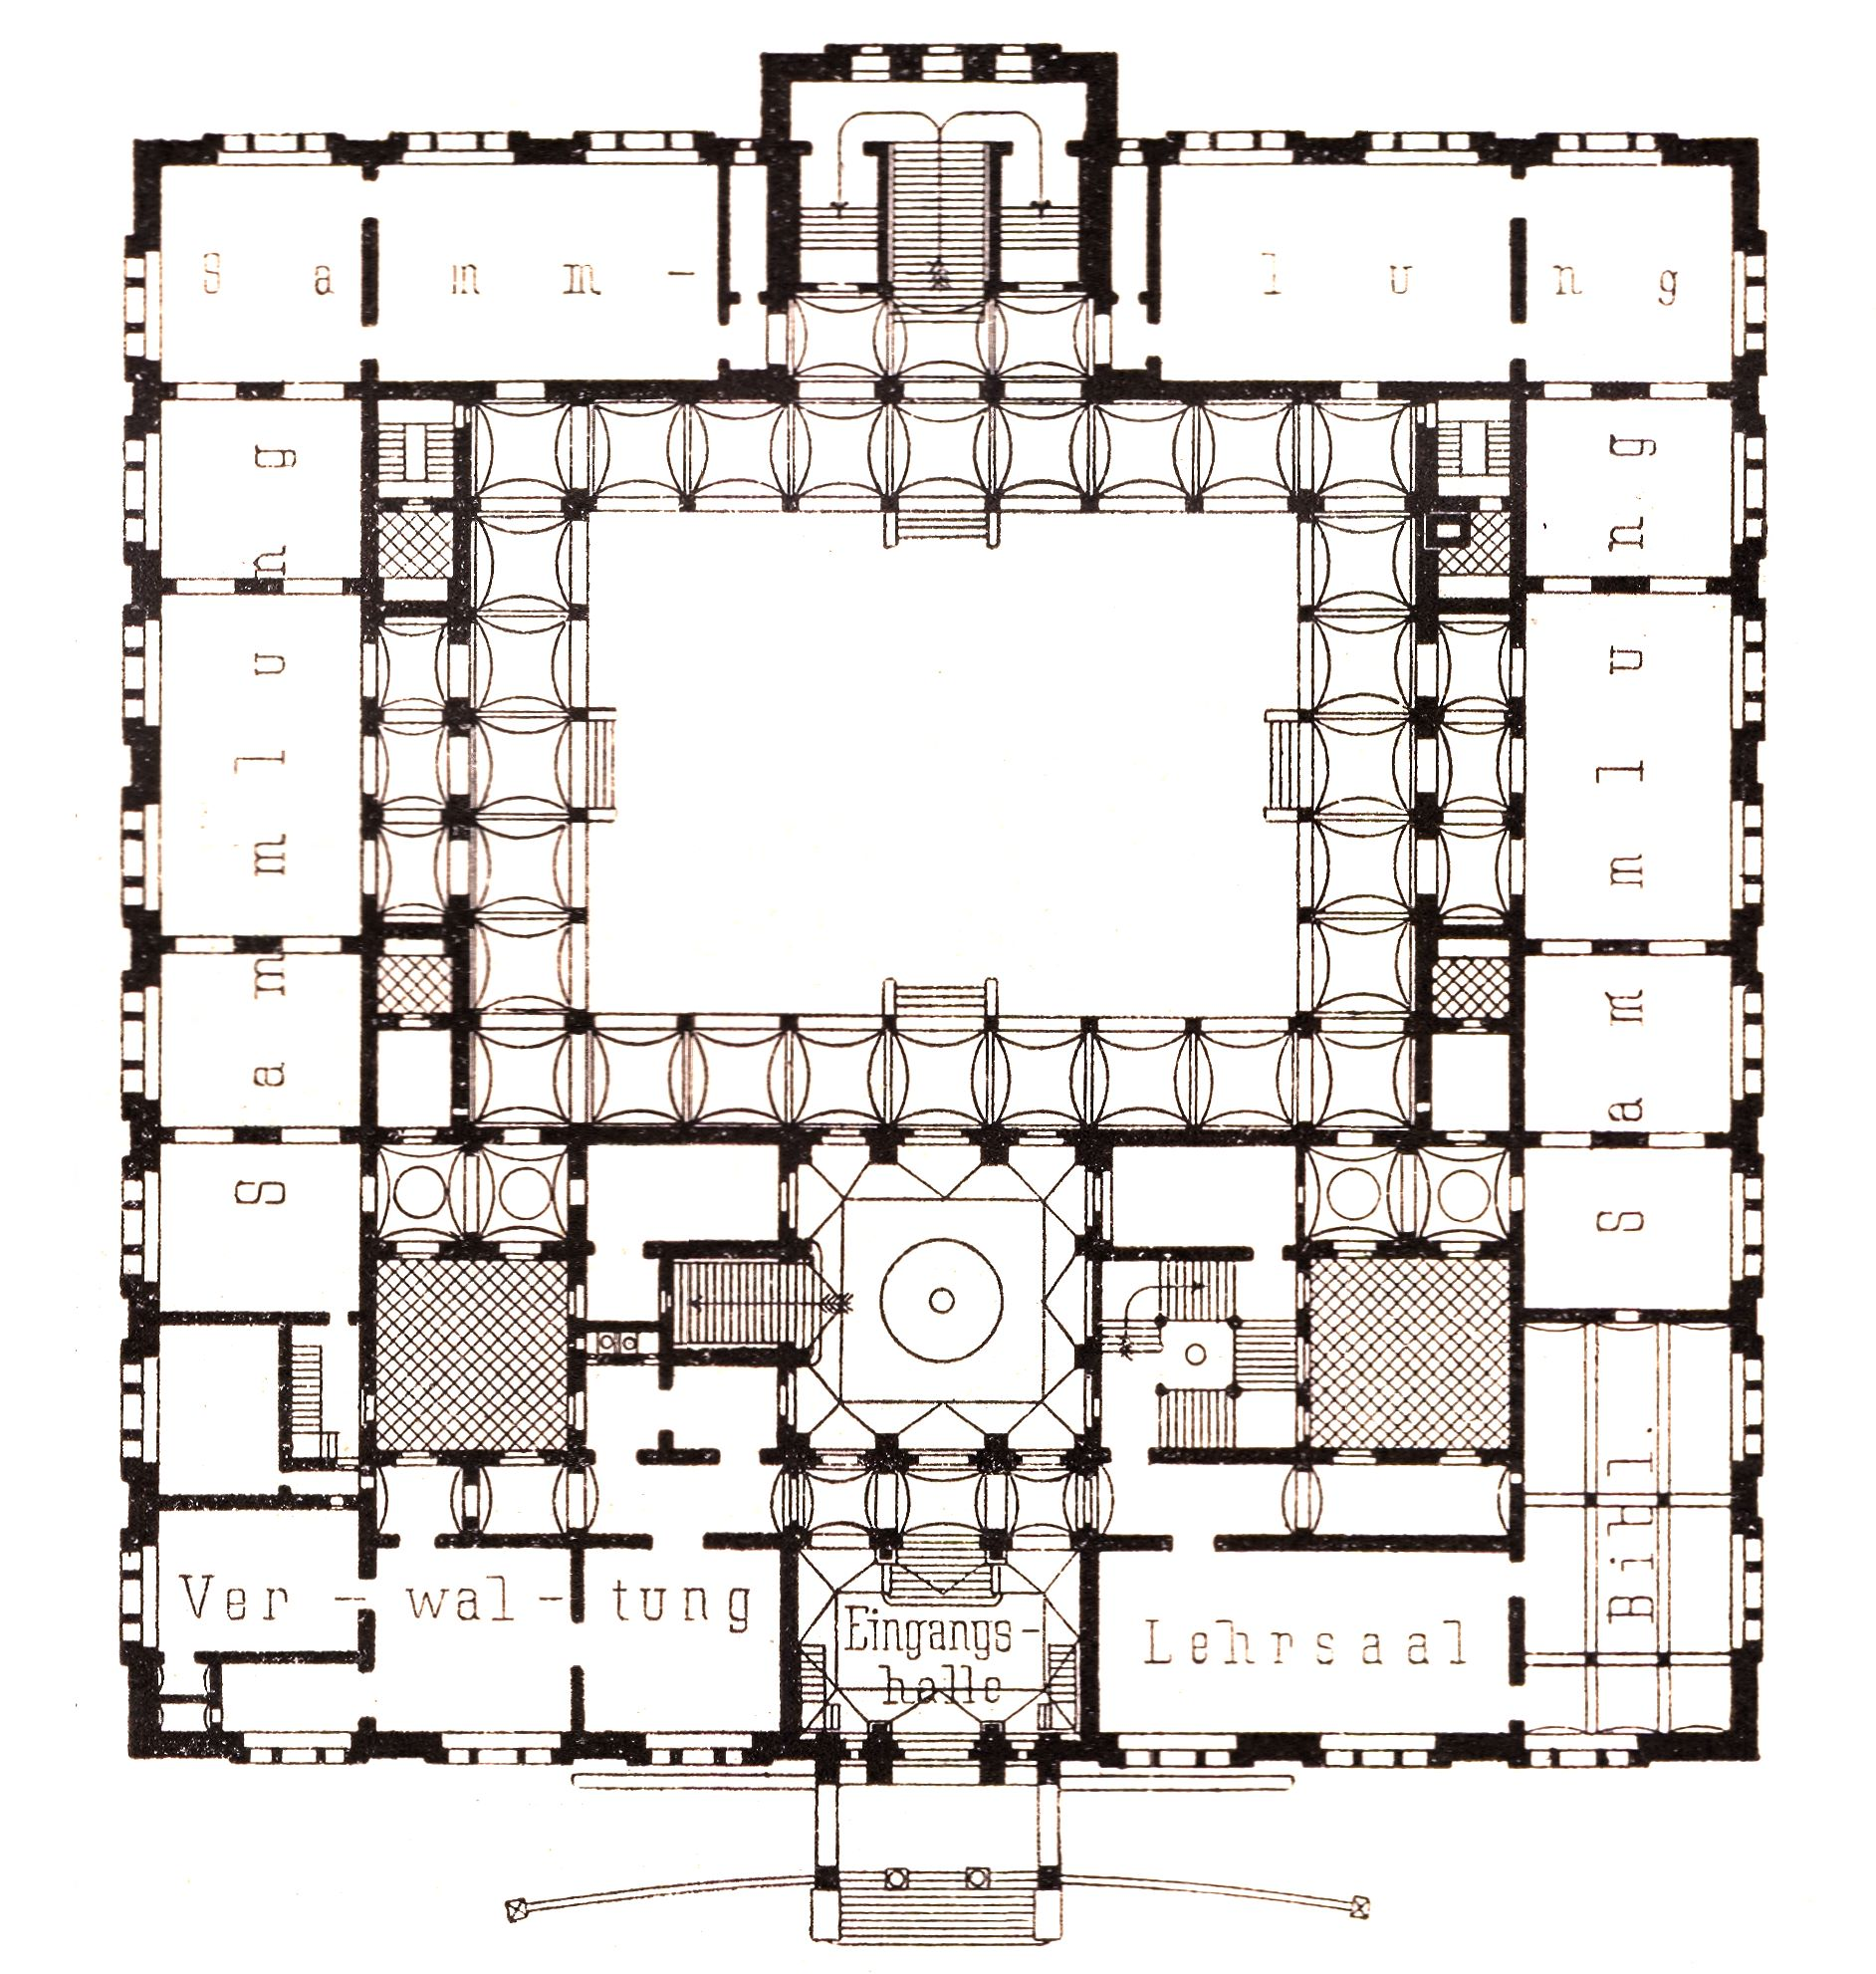 fil berlin ehemaliges kunstgewerbemuseum grundriss wikipedia. Black Bedroom Furniture Sets. Home Design Ideas